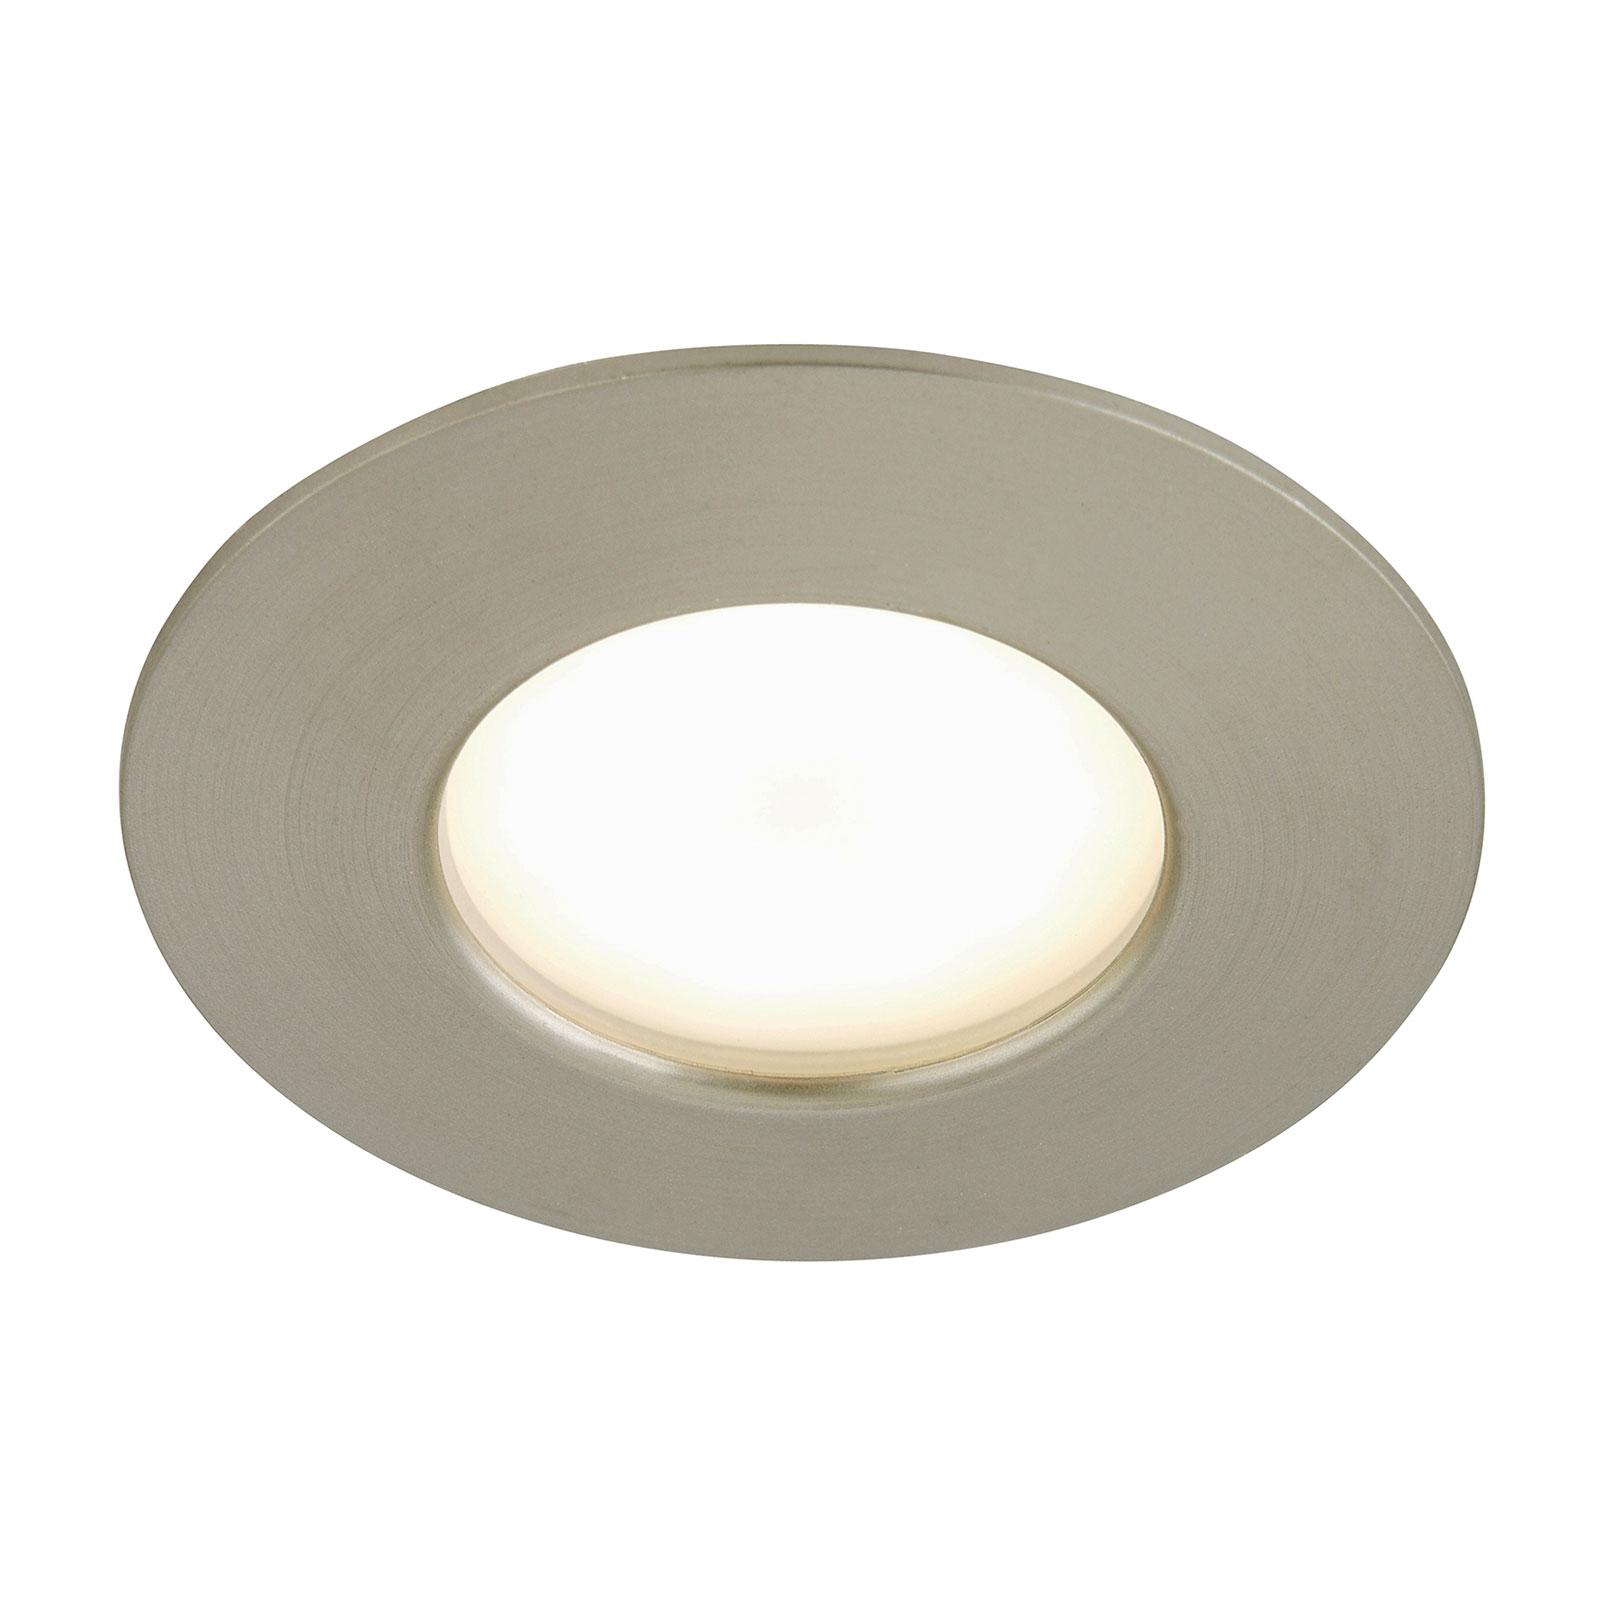 Felia - LED recessed light IP44, matt nickel_1510318_1